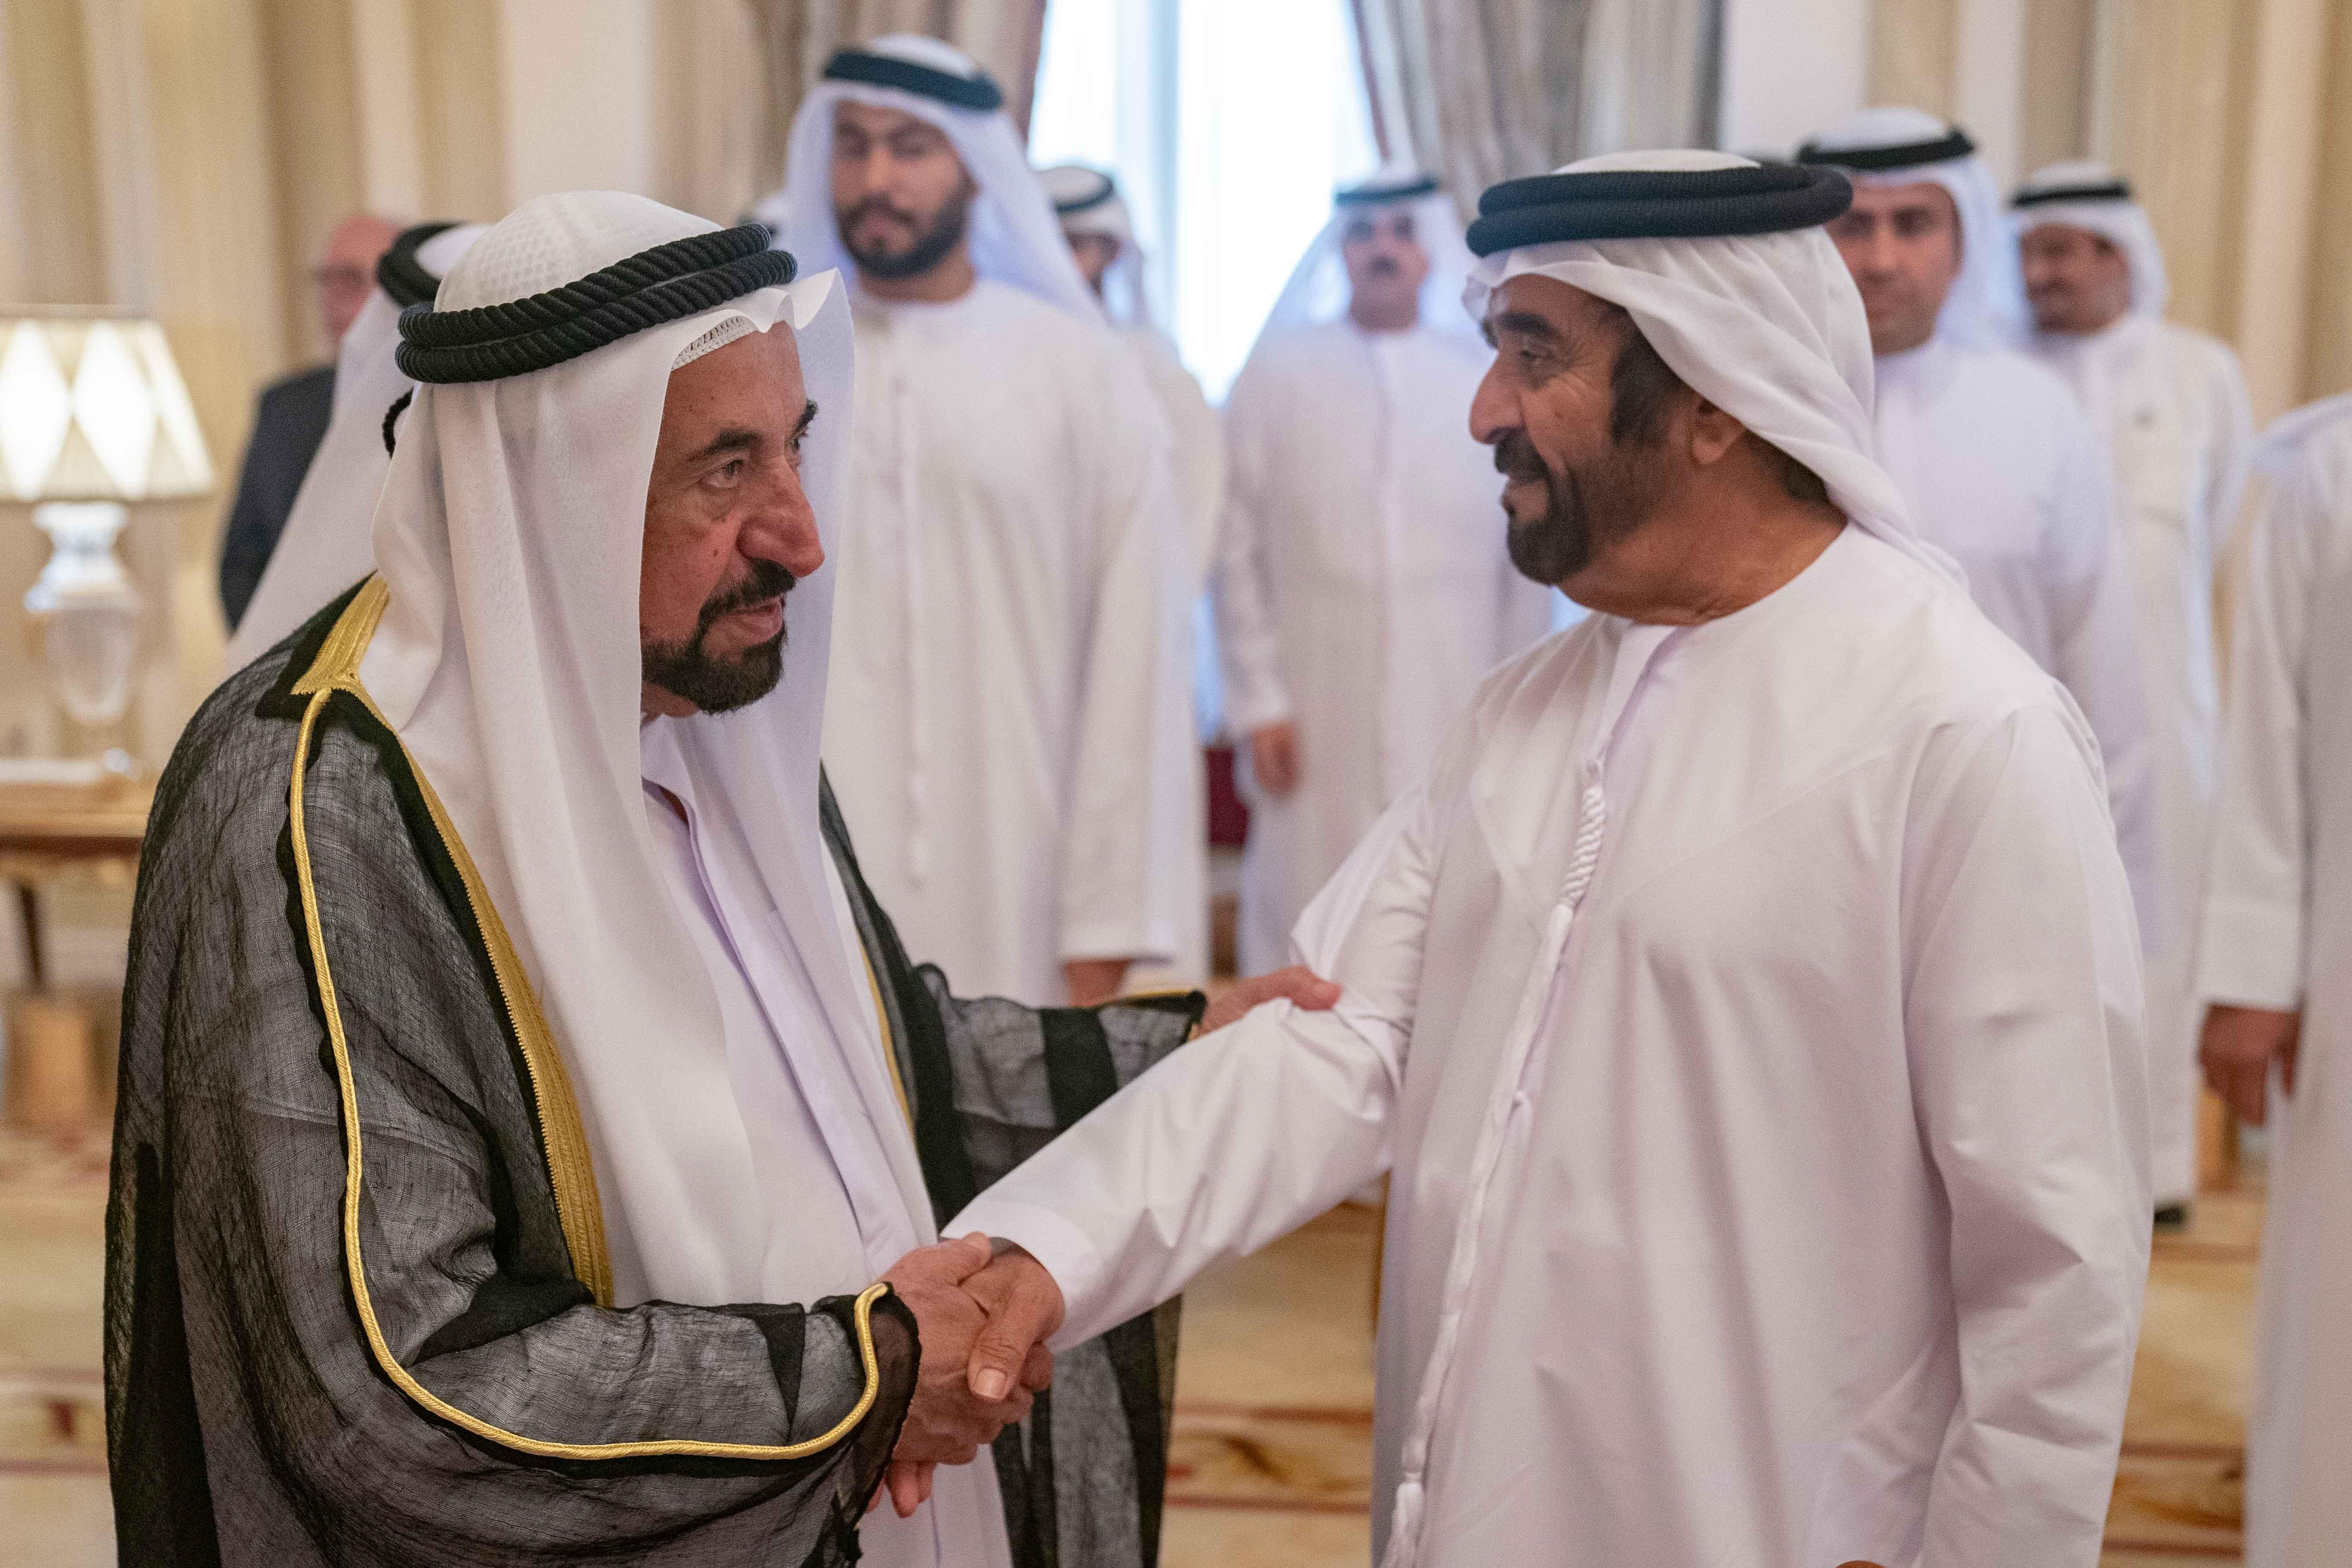 Emirates News Agency - Saif bin Mohammed offers condolences